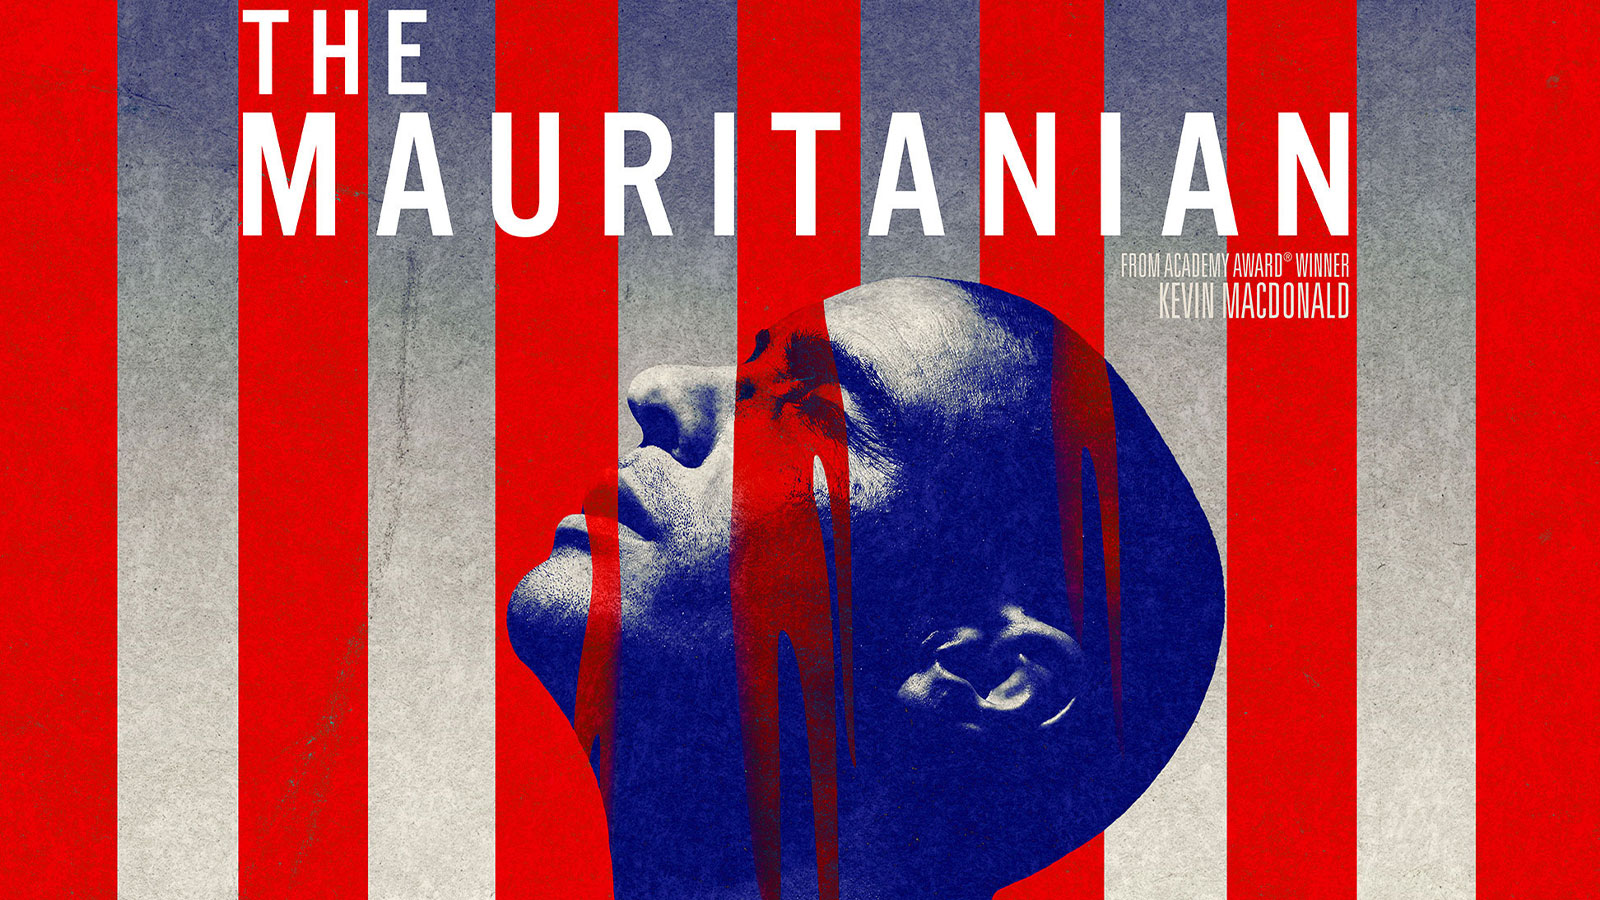 تریلر فیلم The Mauritanian